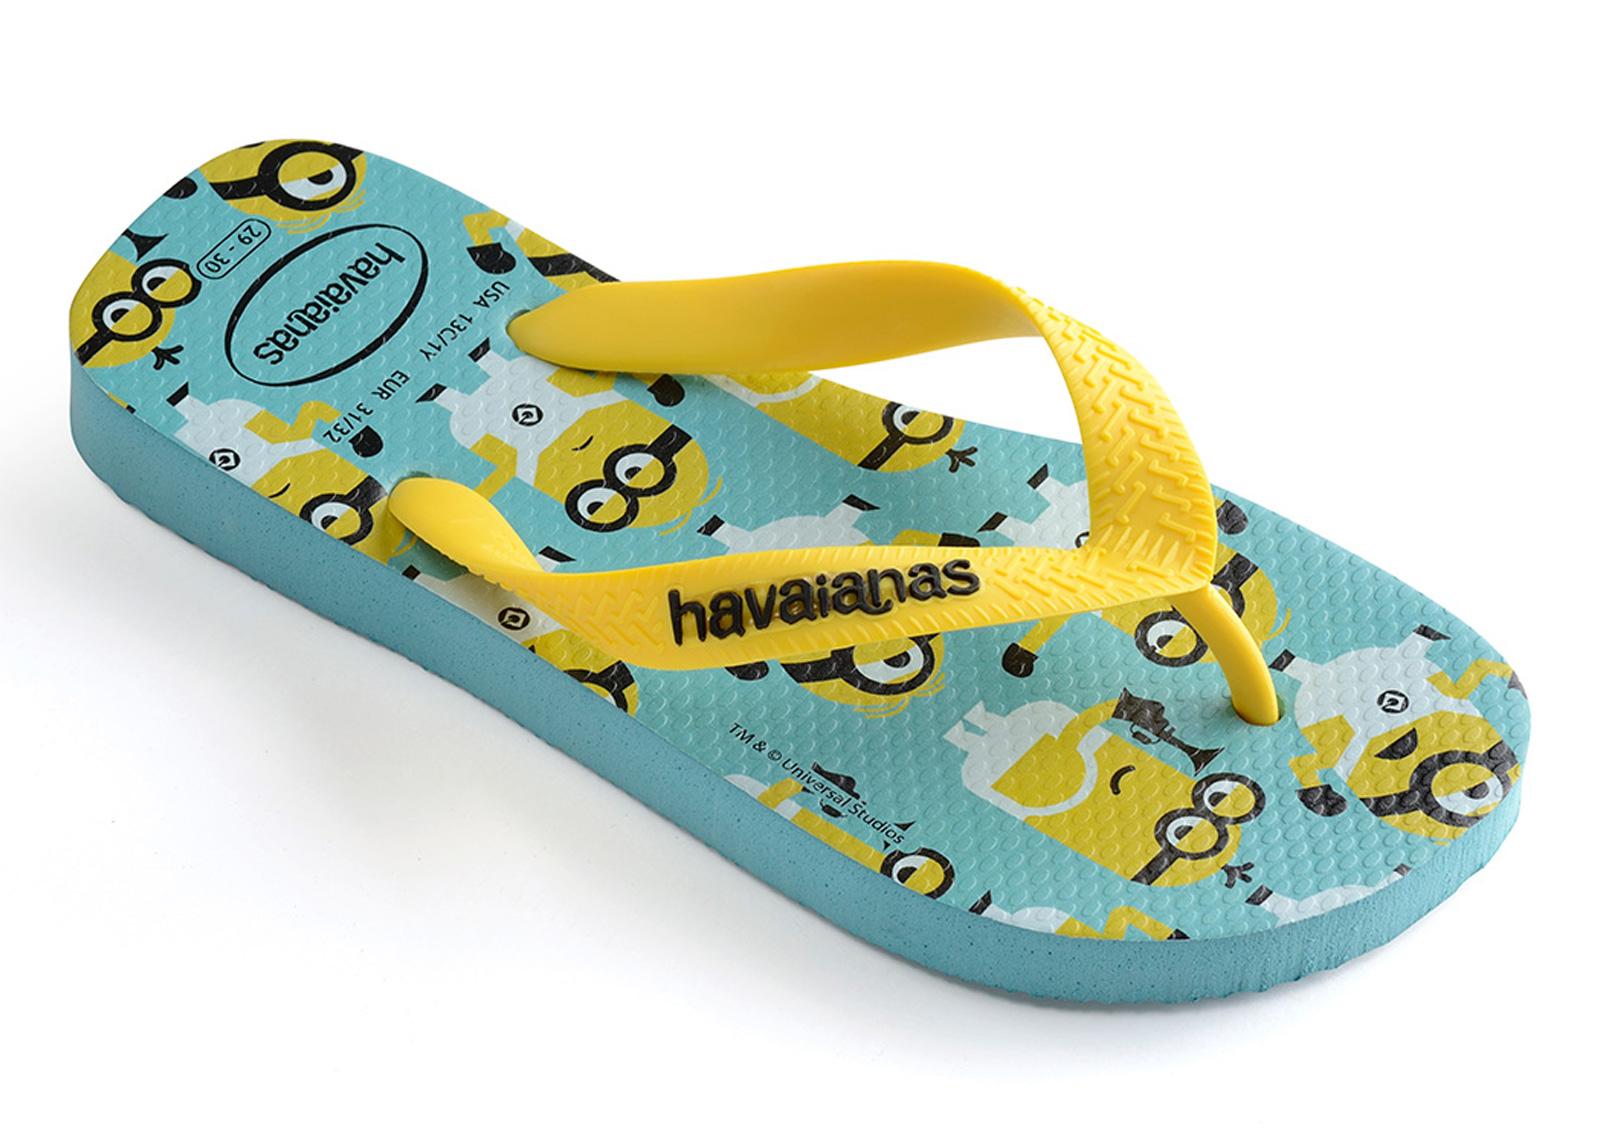 77dc559fd53df7 Flip-Flops Minions Blue - Brand Havaianas